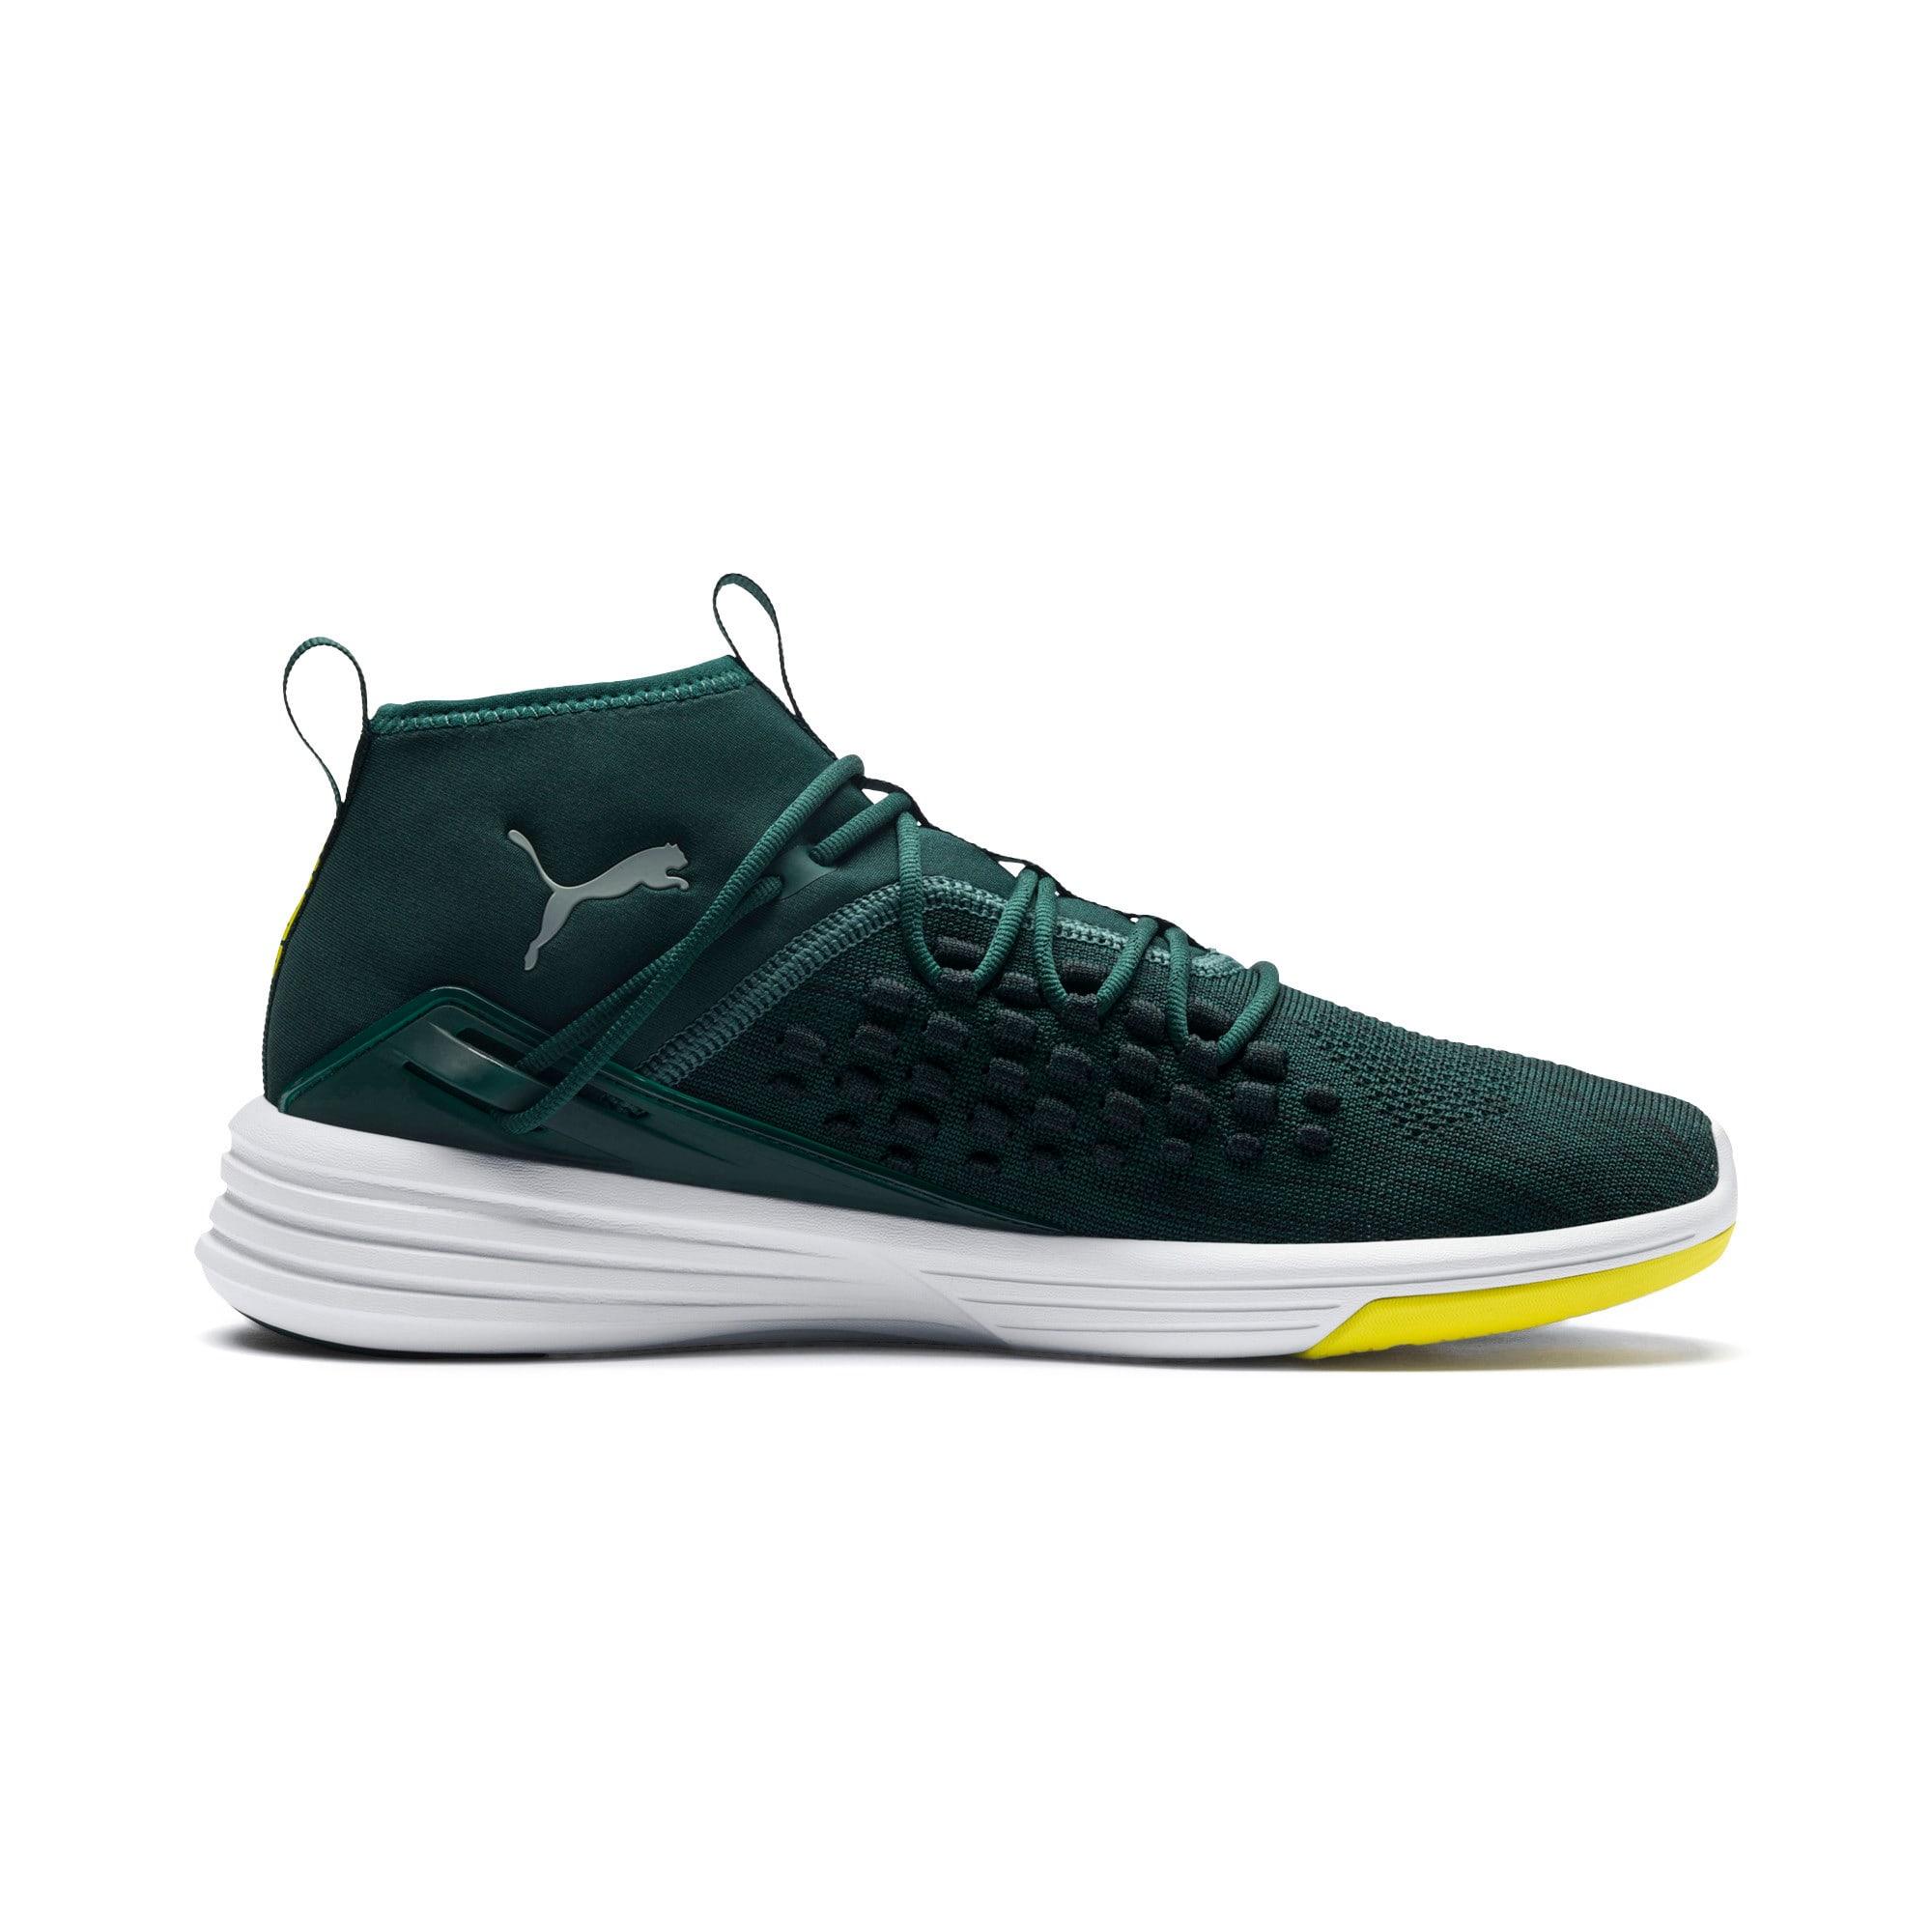 Thumbnail 6 of Mantra Herren Sneaker, Ponderosa Pine-Puma White, medium